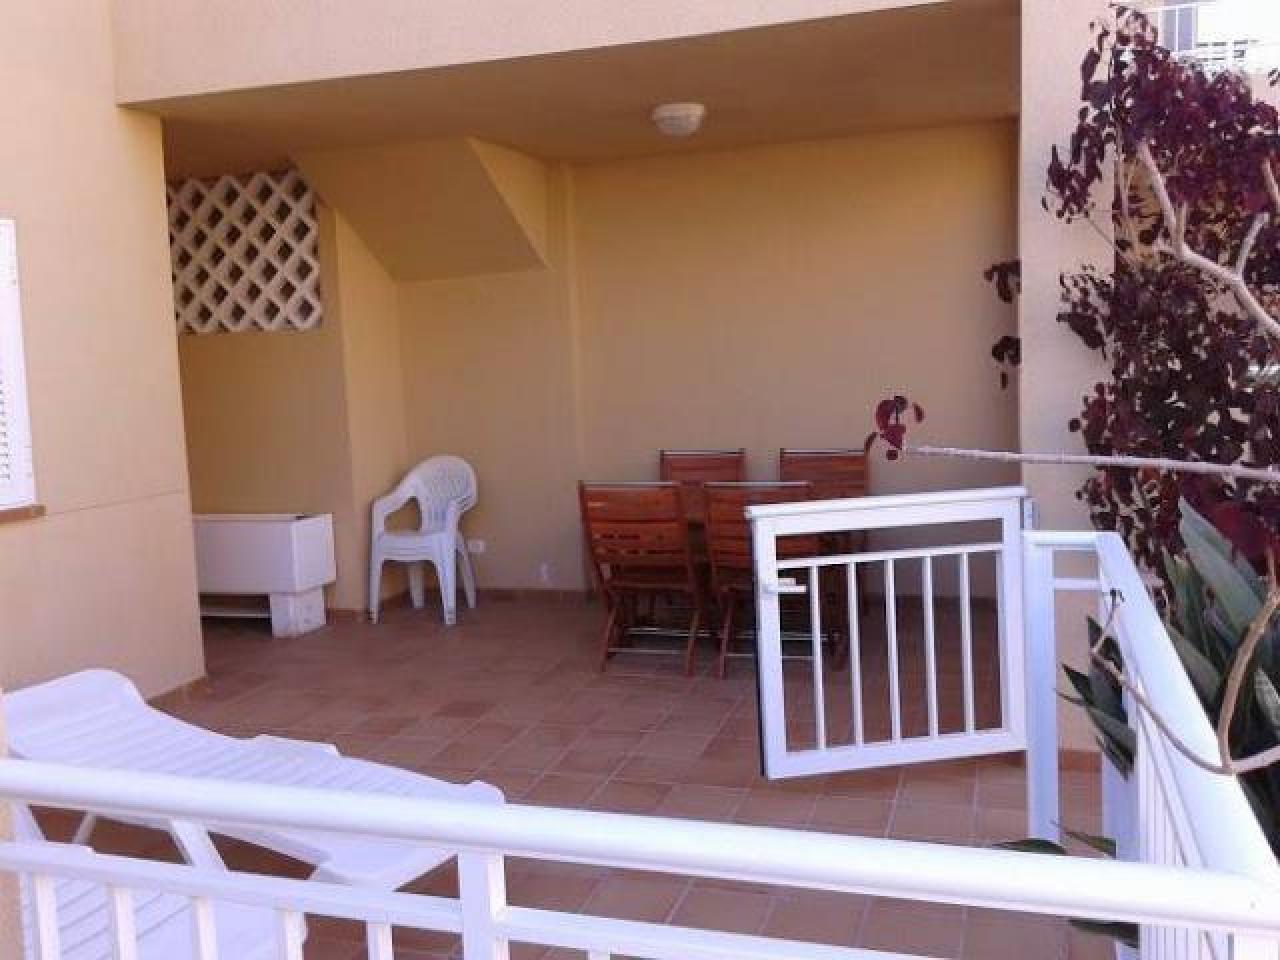 Apartment in Tenerife for rent - 4